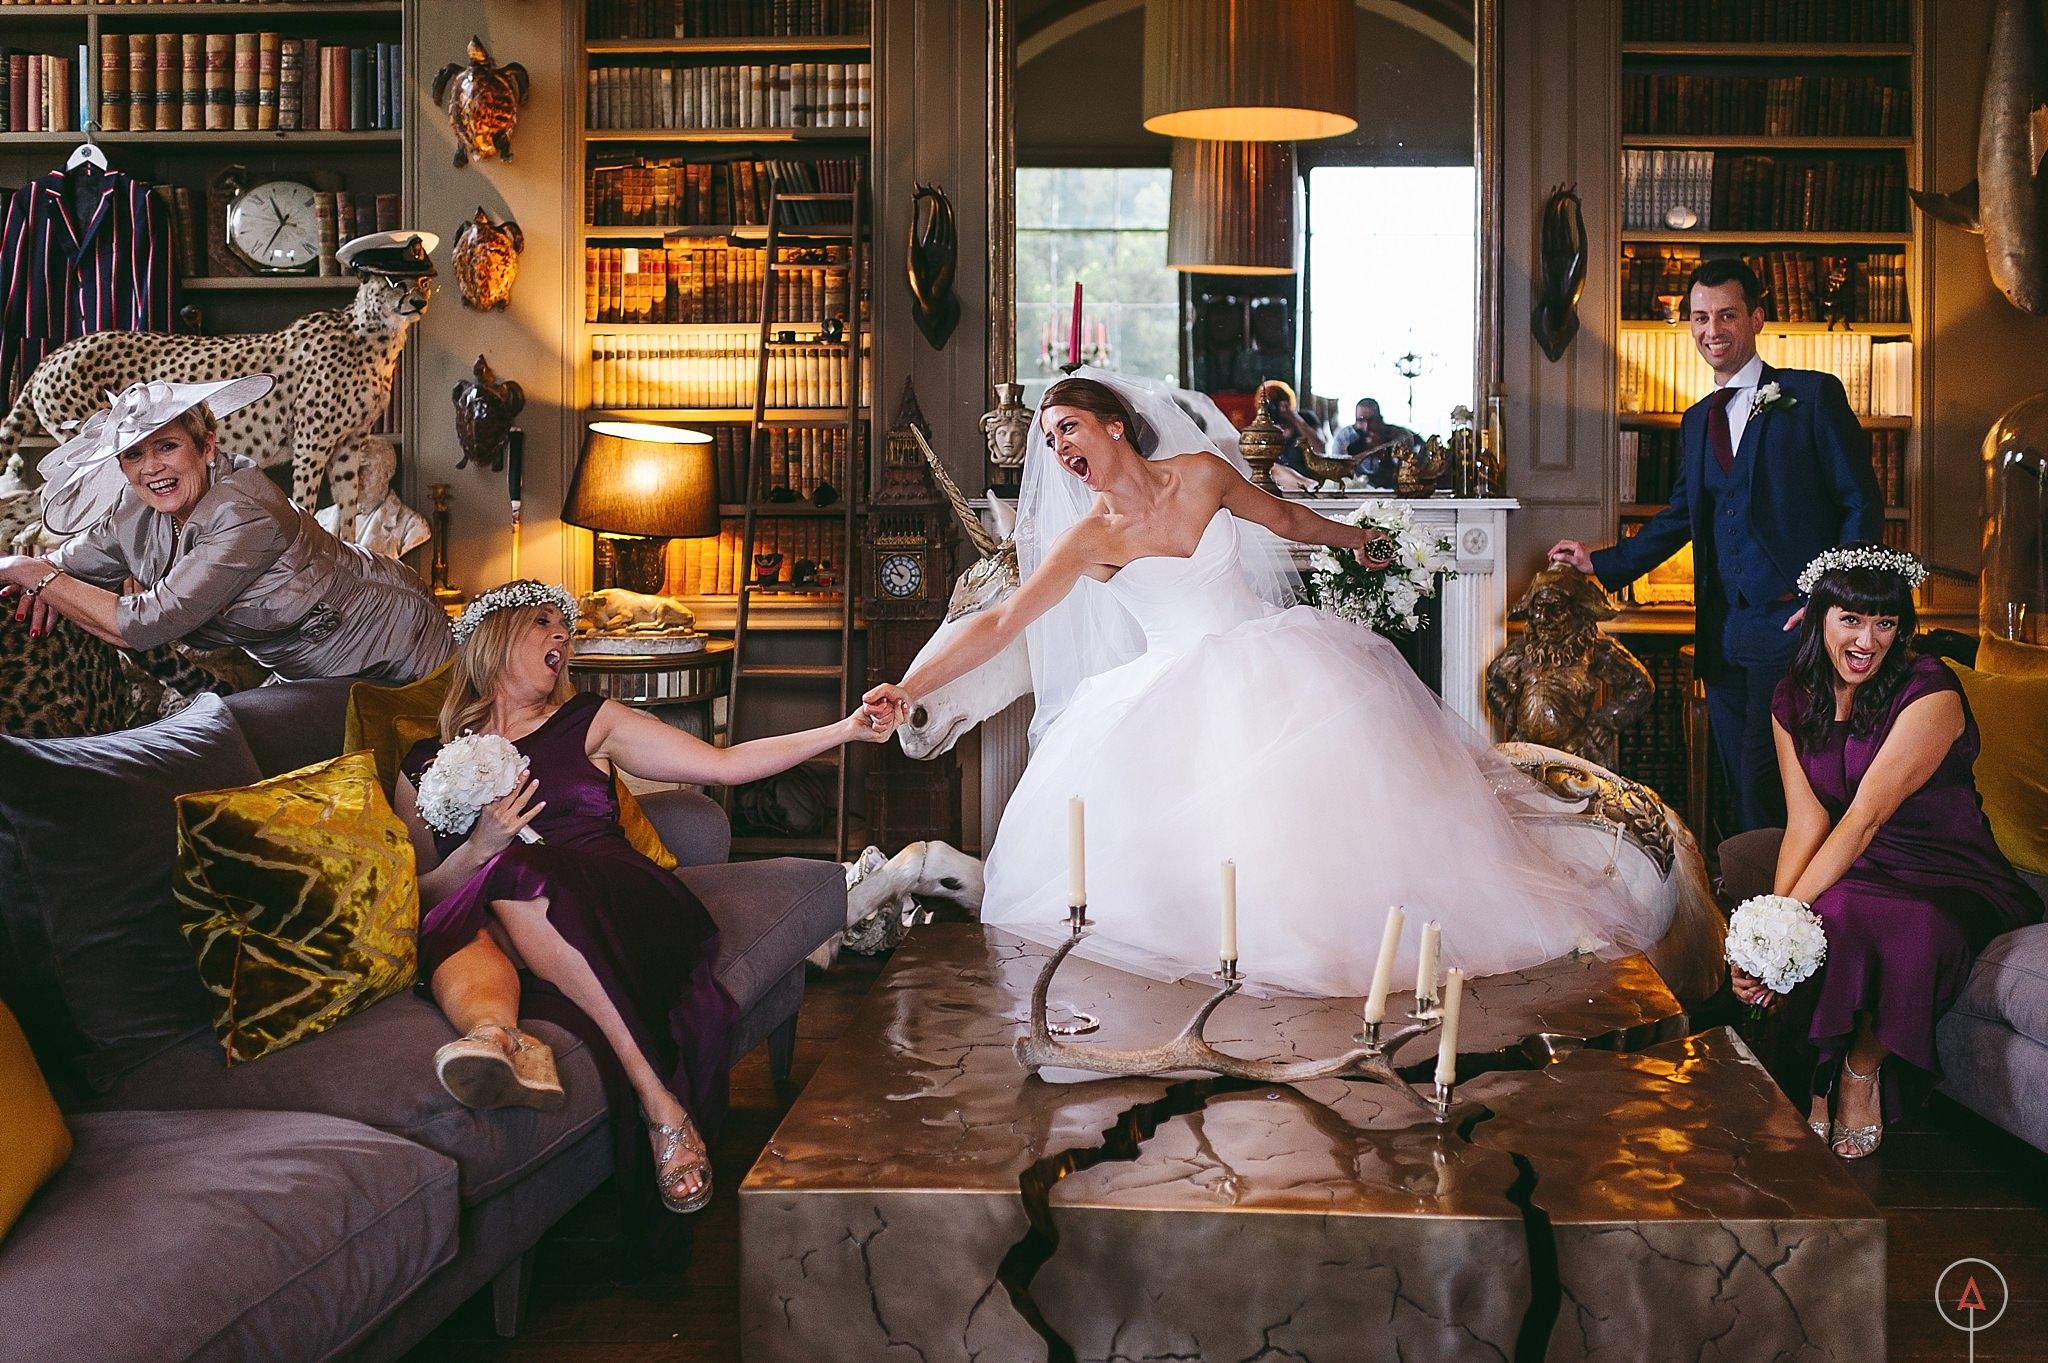 cardiff-wedding-photographer-aga-tomaszek_0276